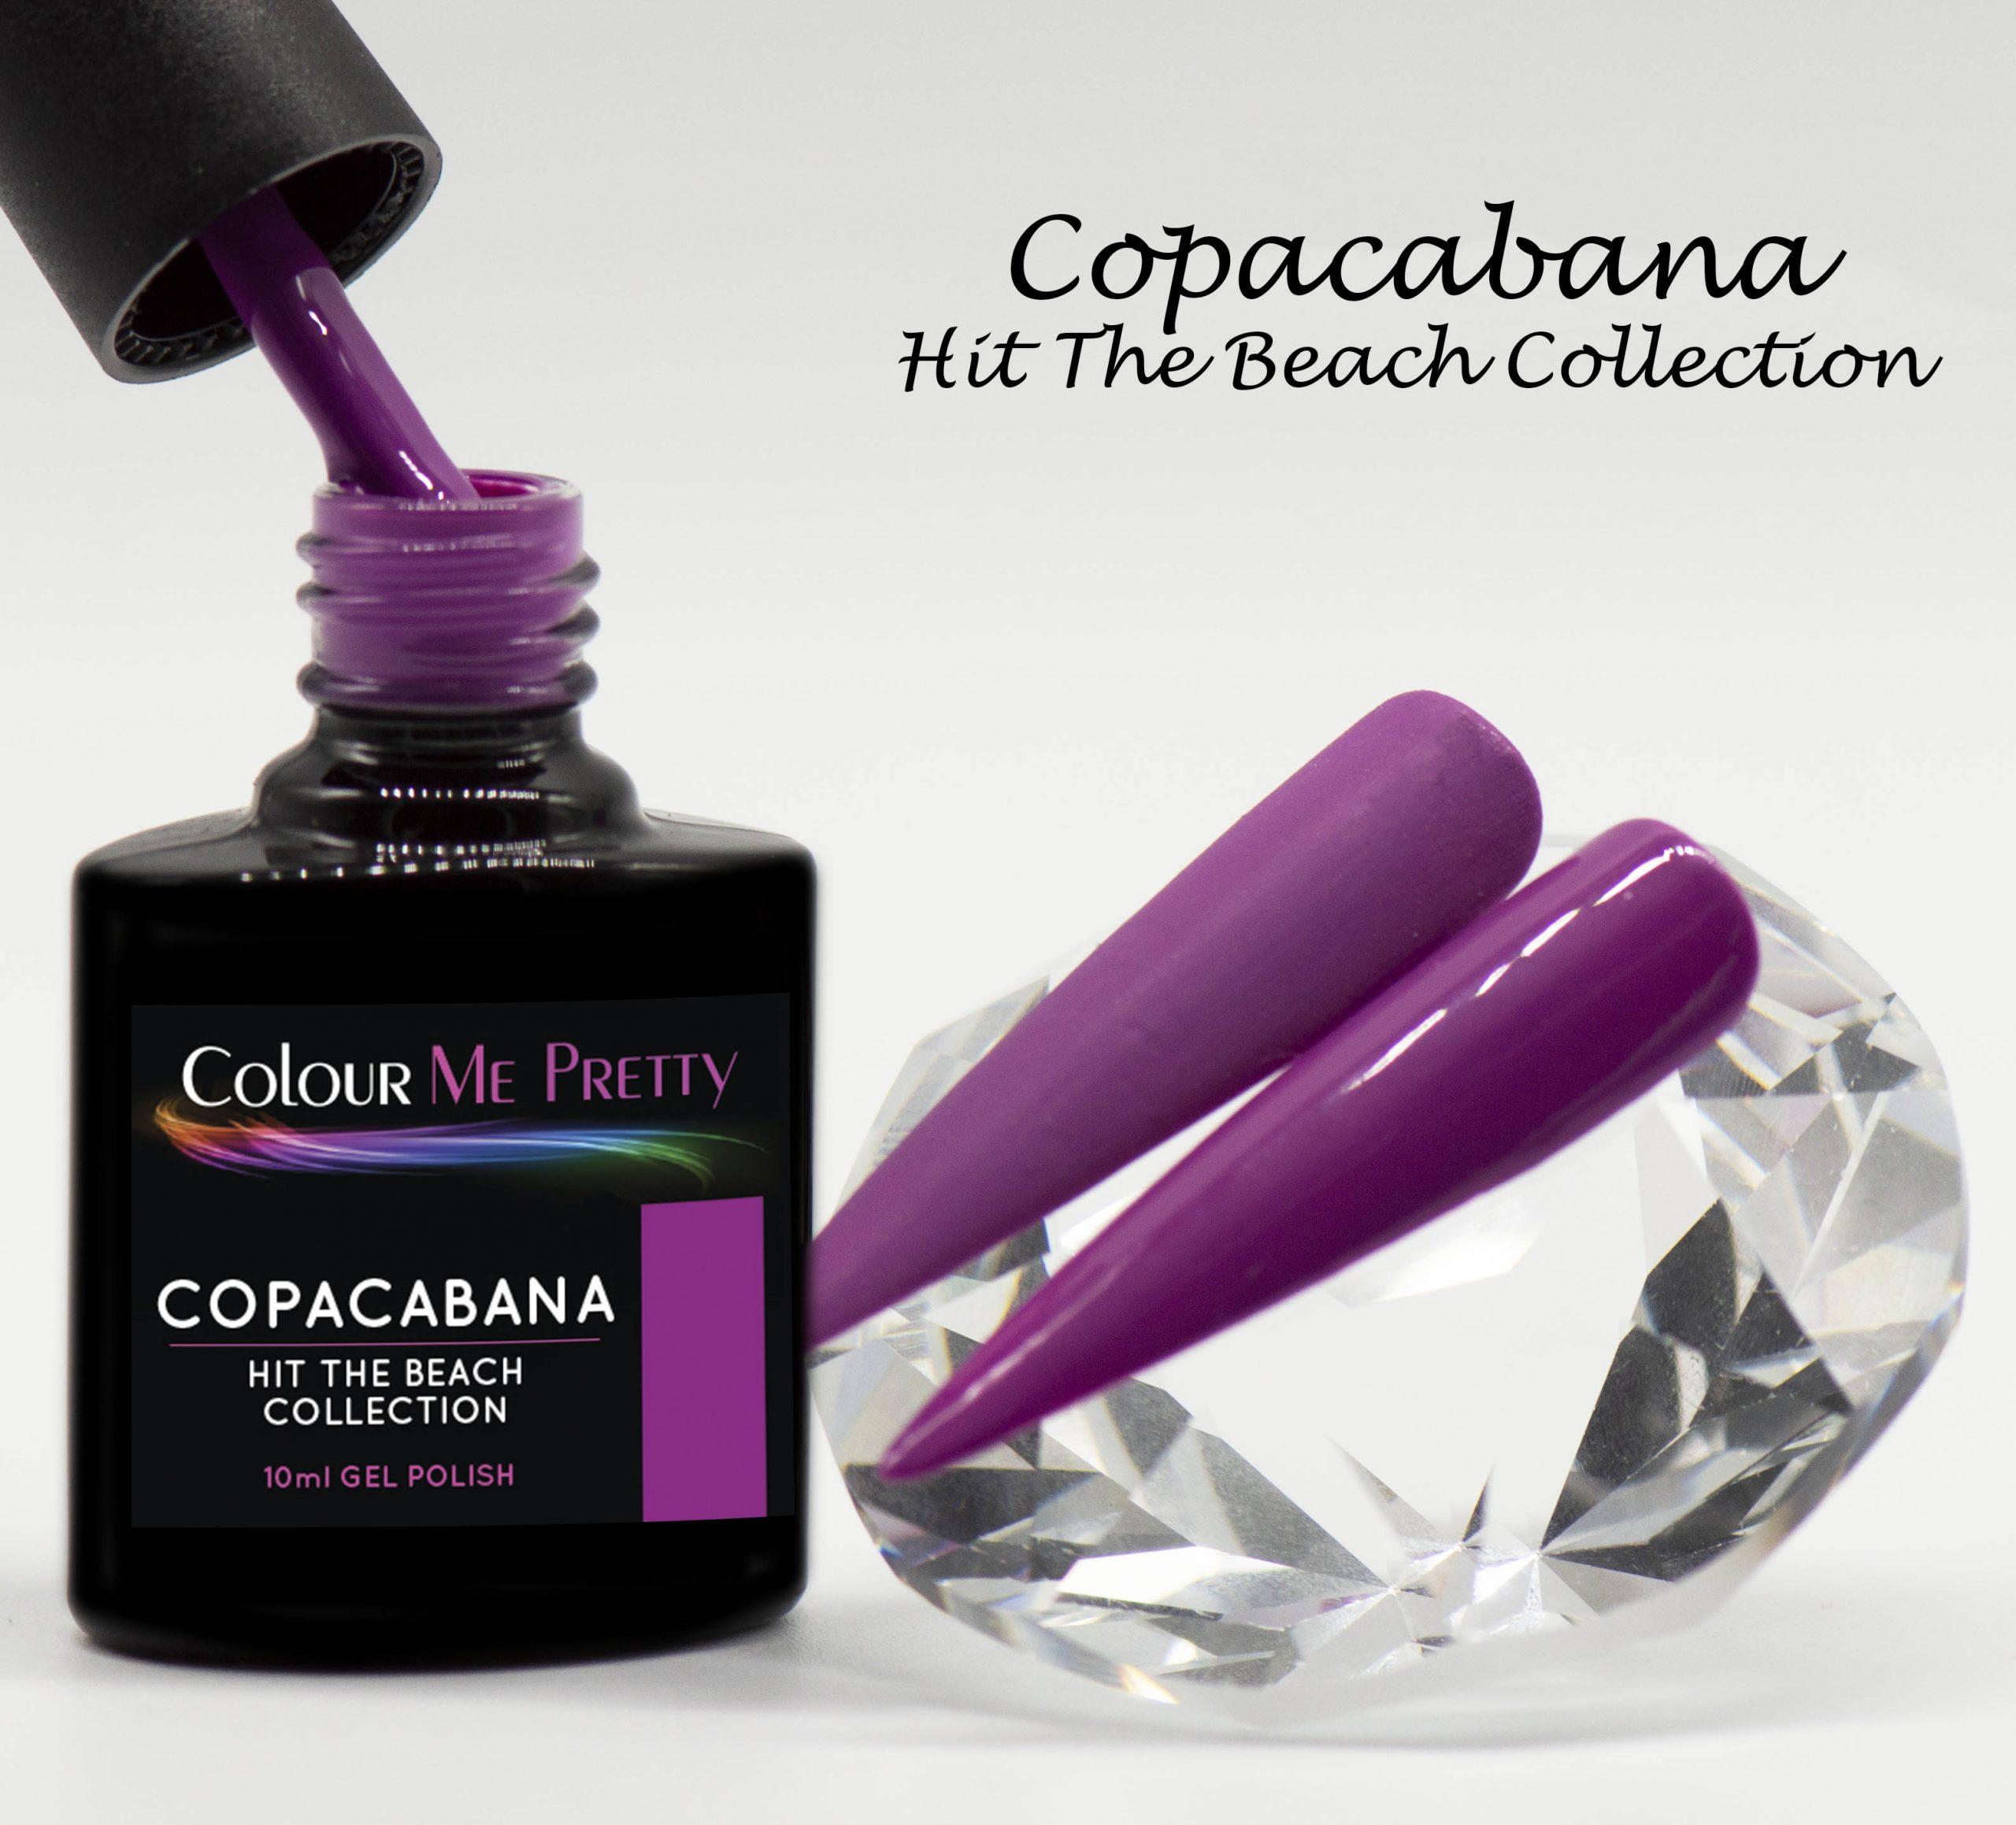 Hit The Beach Copacabana